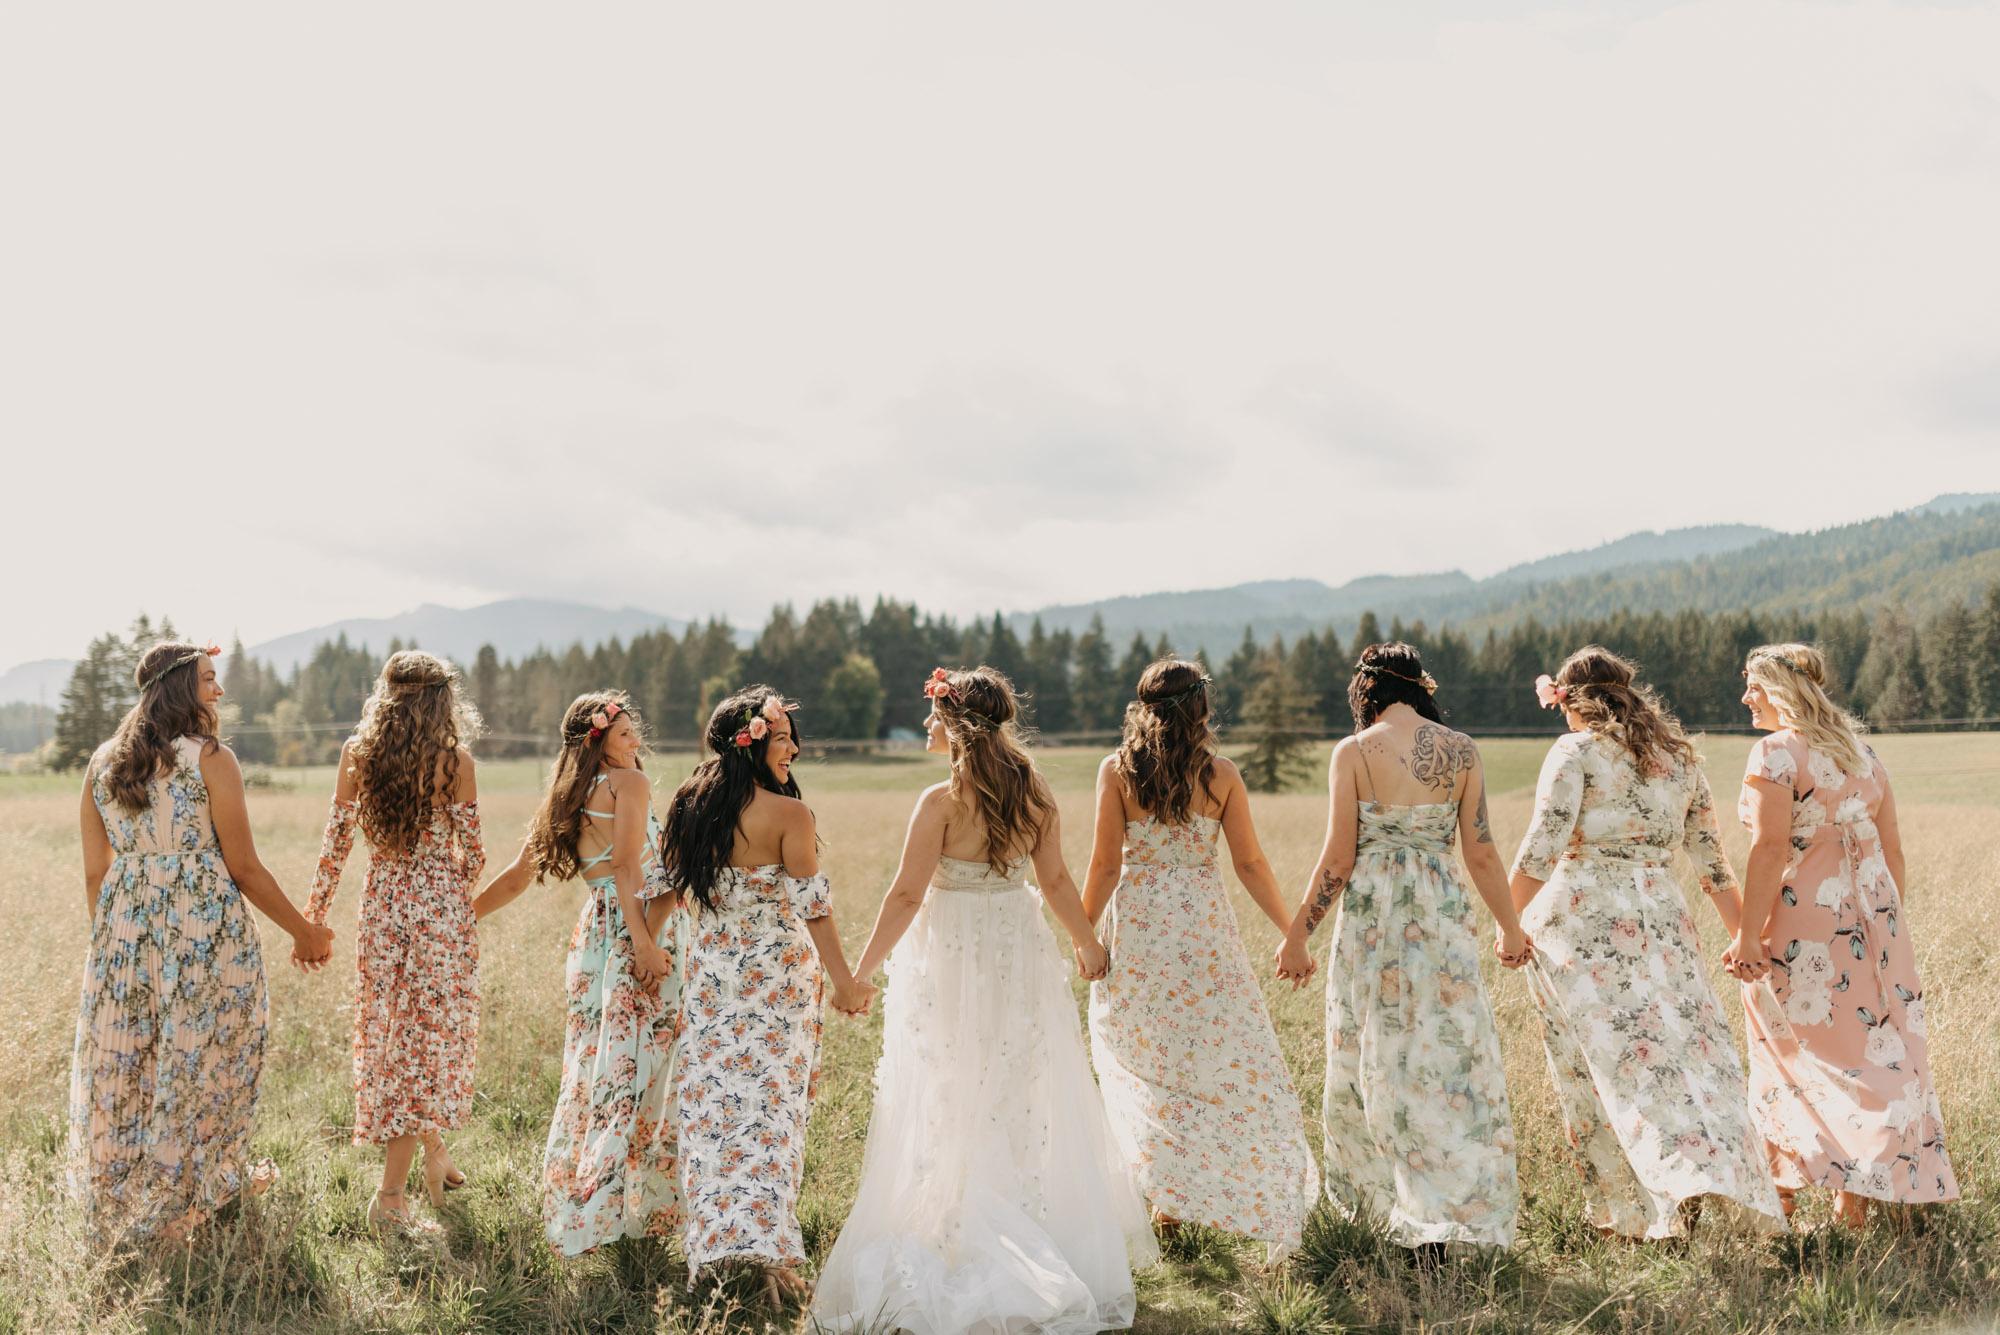 Bridal-Party-Free-People-Flower-Dresses-Washington-Wedding-8542.jpg